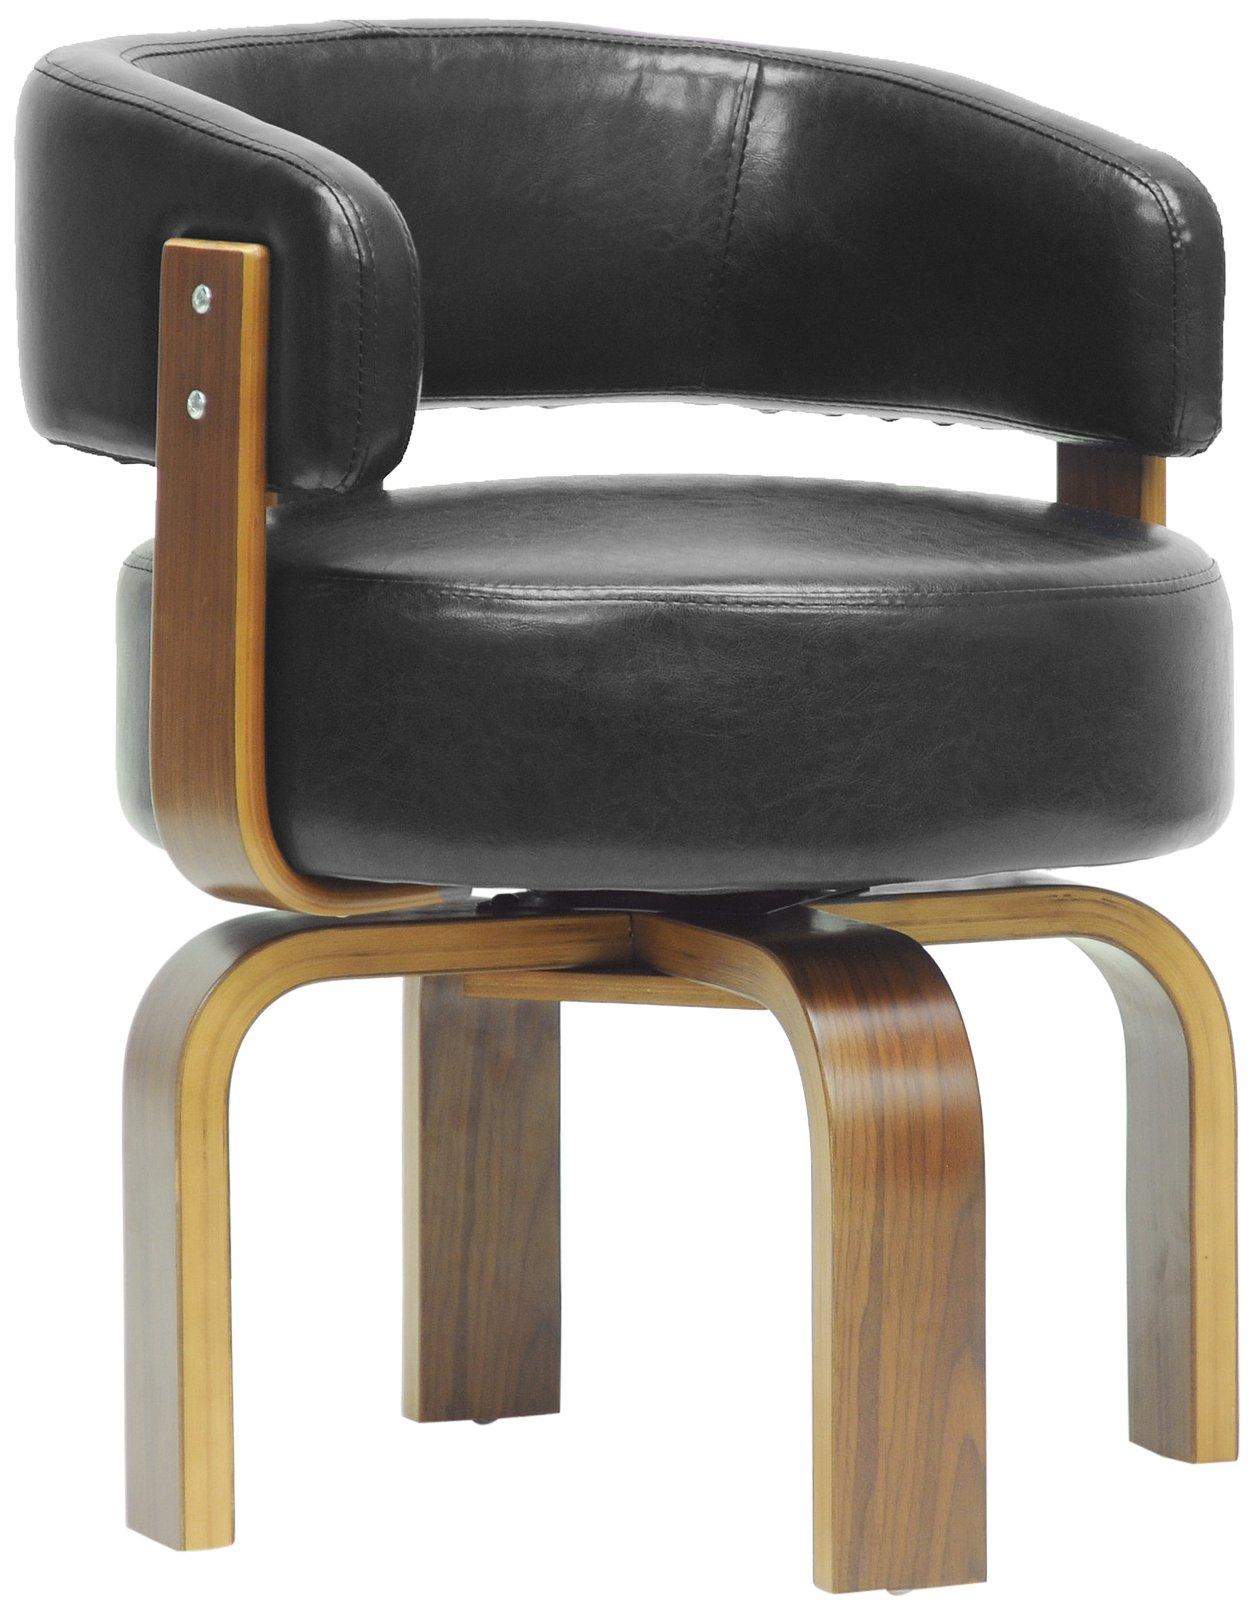 Baxton Studio Fortson Modern Accent Chair, Walnut/Black